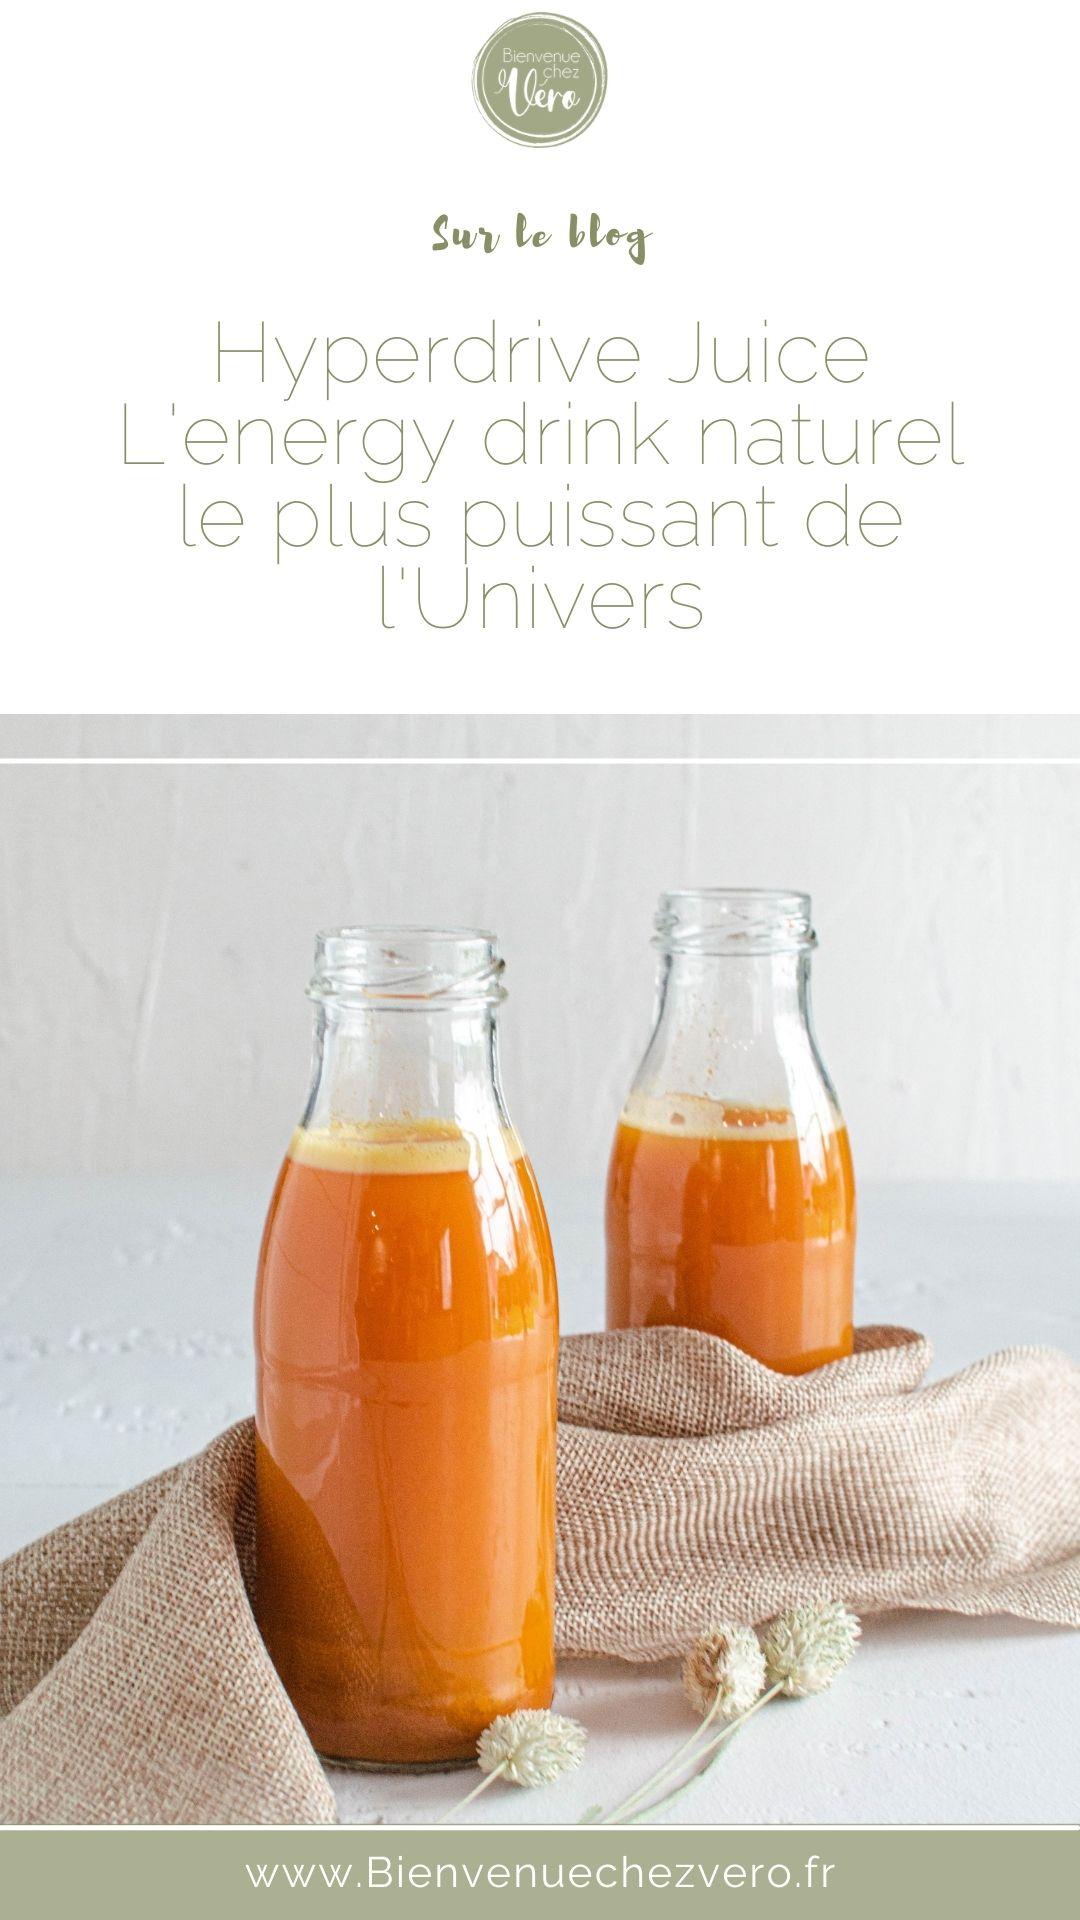 Energy drink naturel